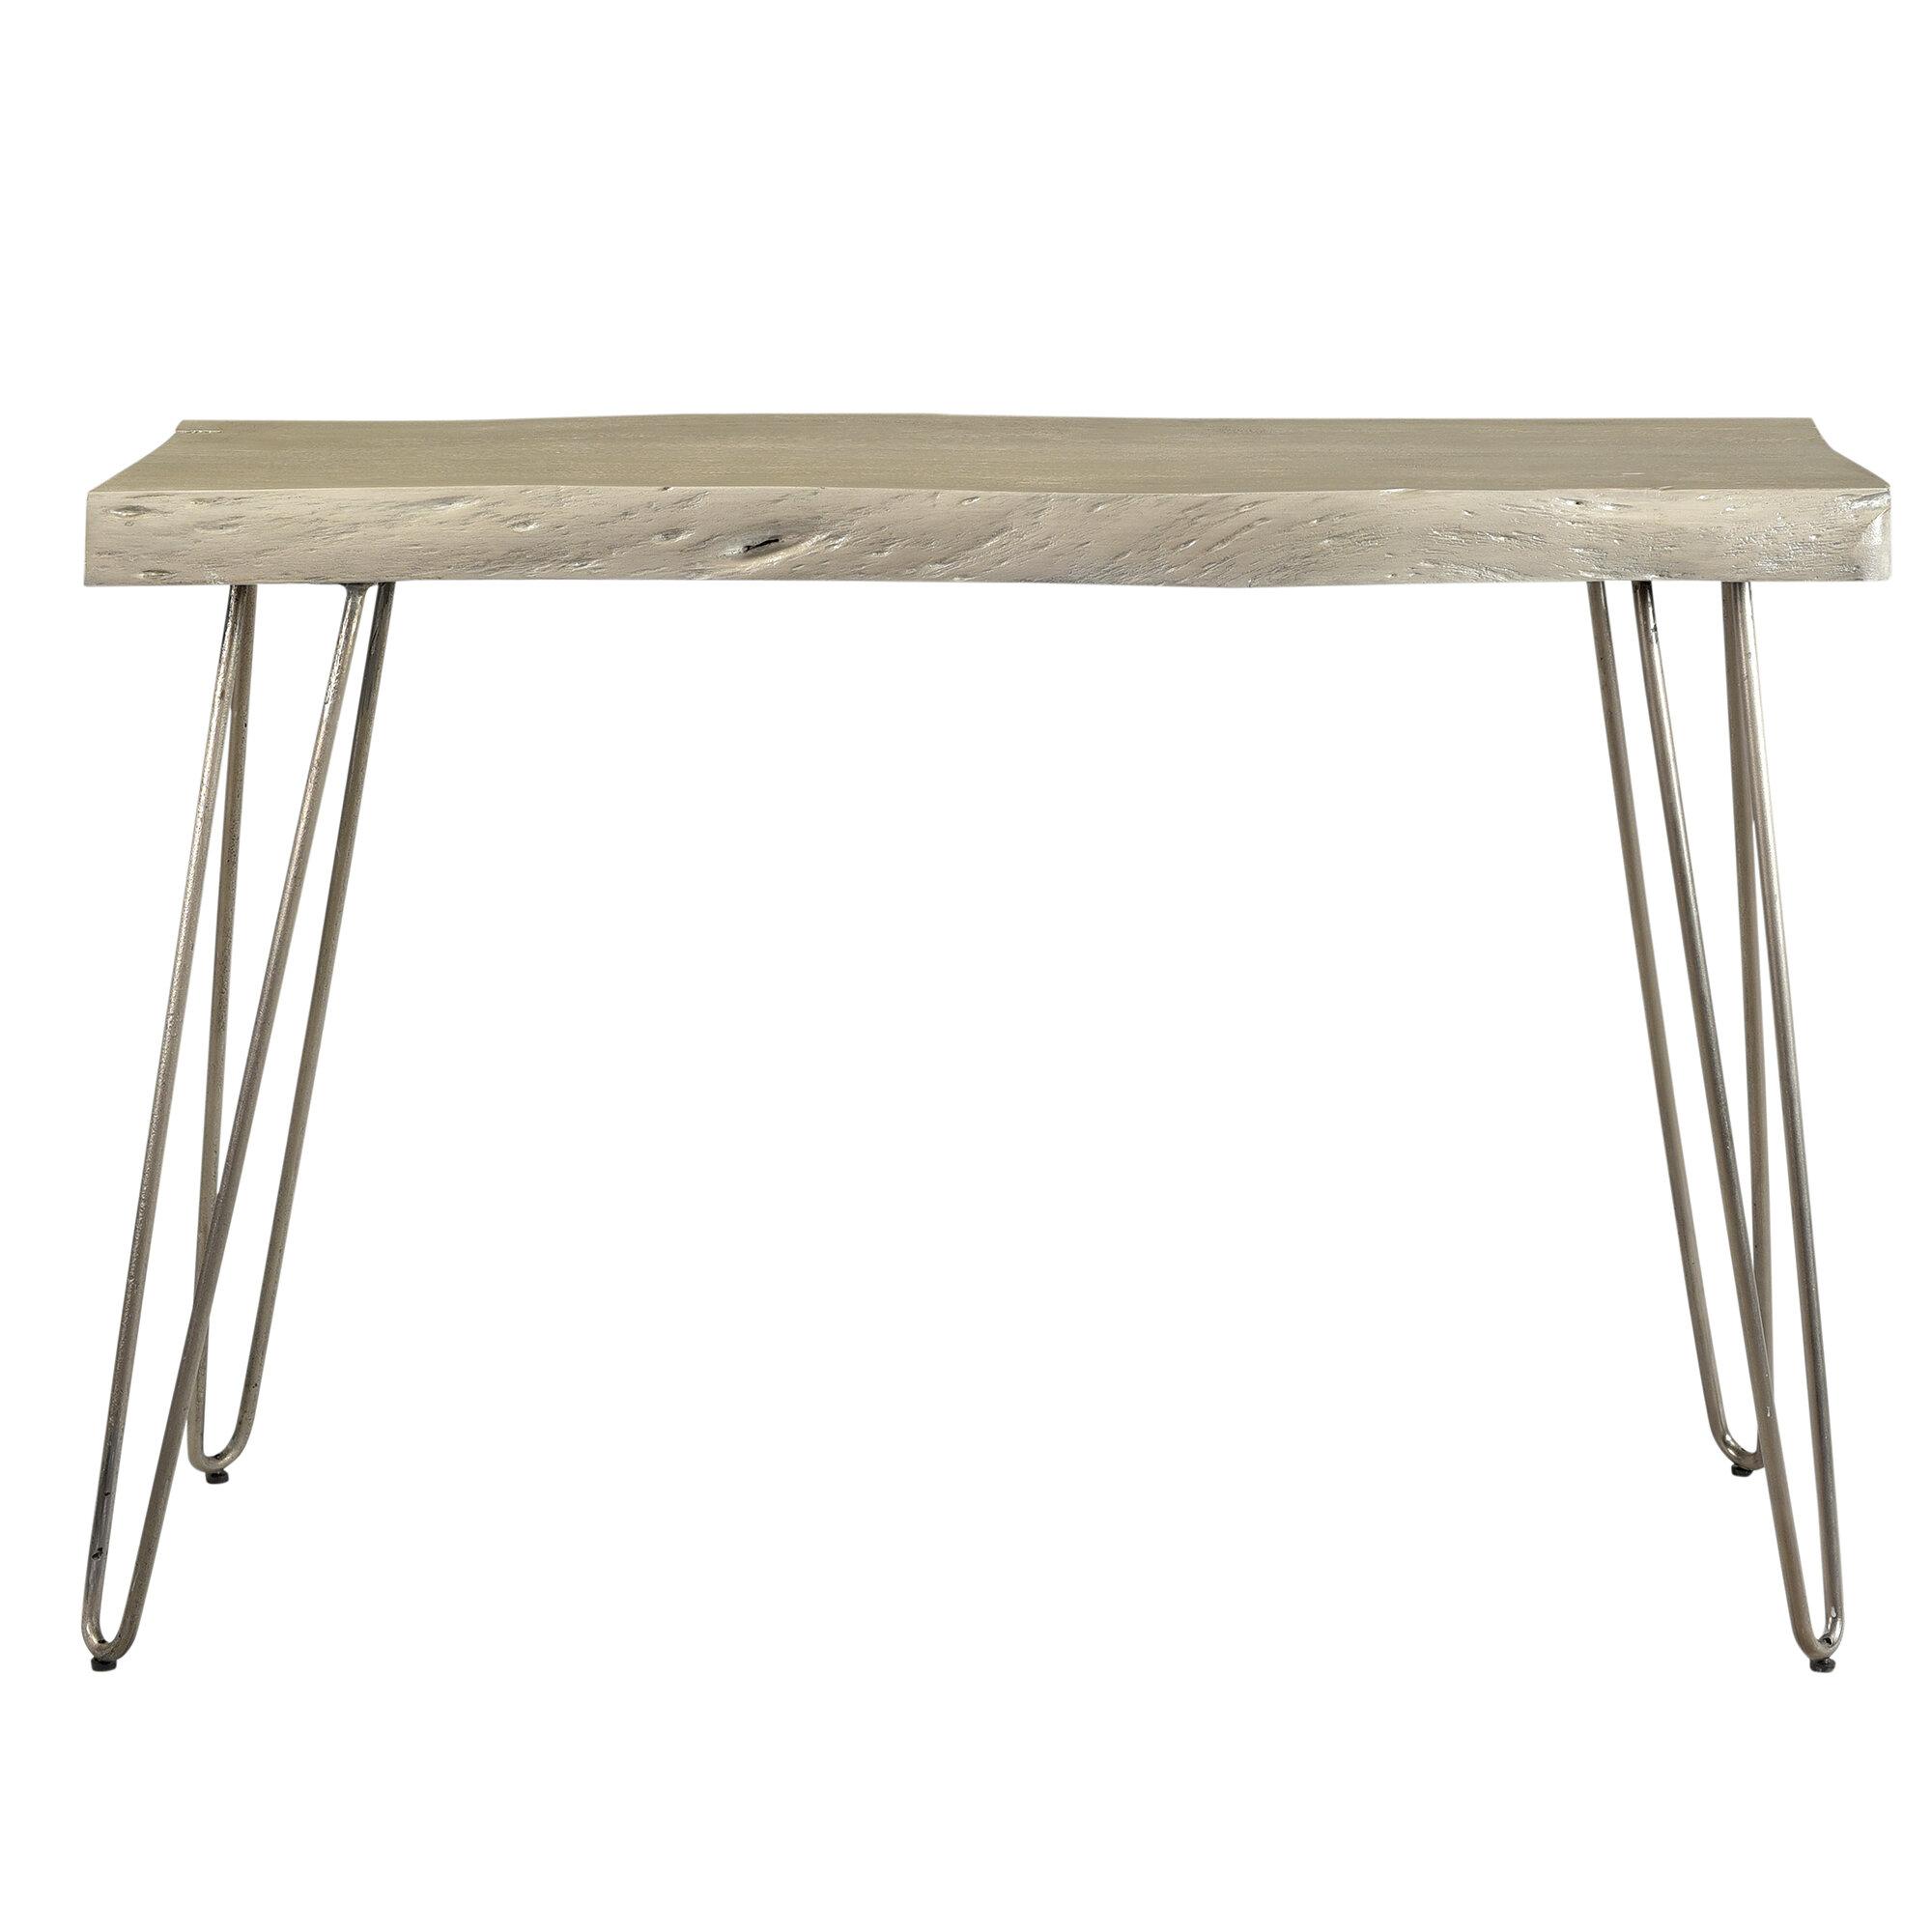 Spurlin acacia wood console table reviews allmodern